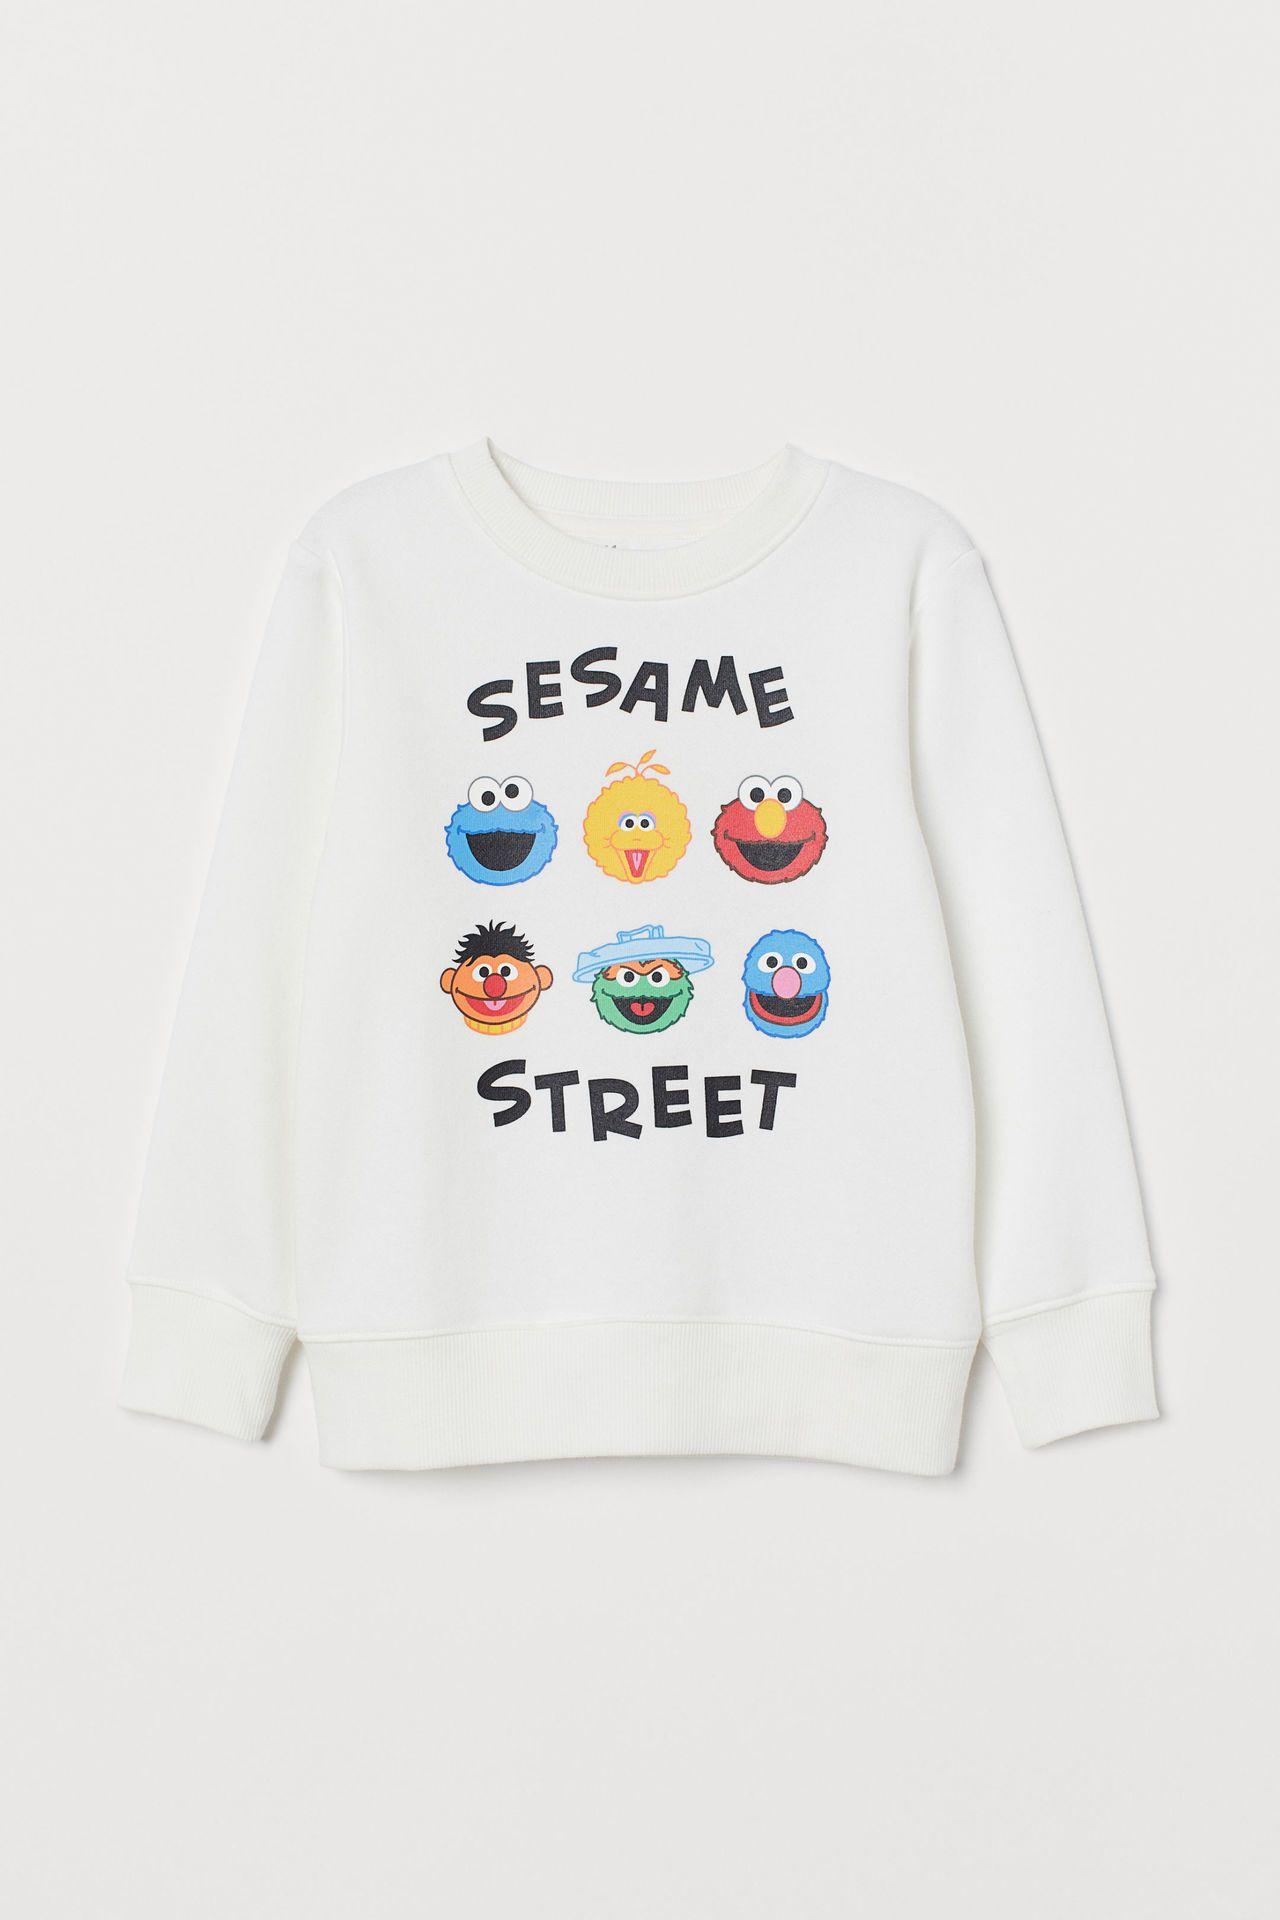 H&M X 芝麻街合作系列童裝,售價499元。圖/H&M提供